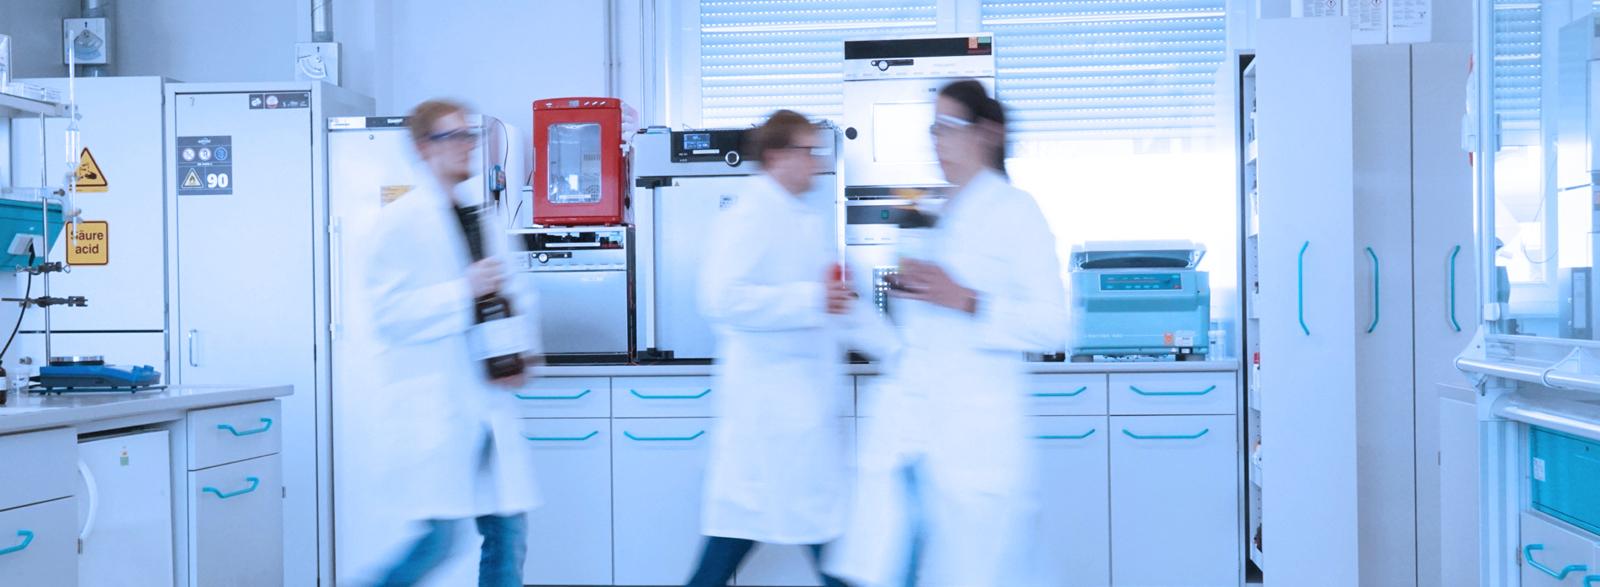 About us, DSI-pharm, laboratory for pharmaceutical analysis